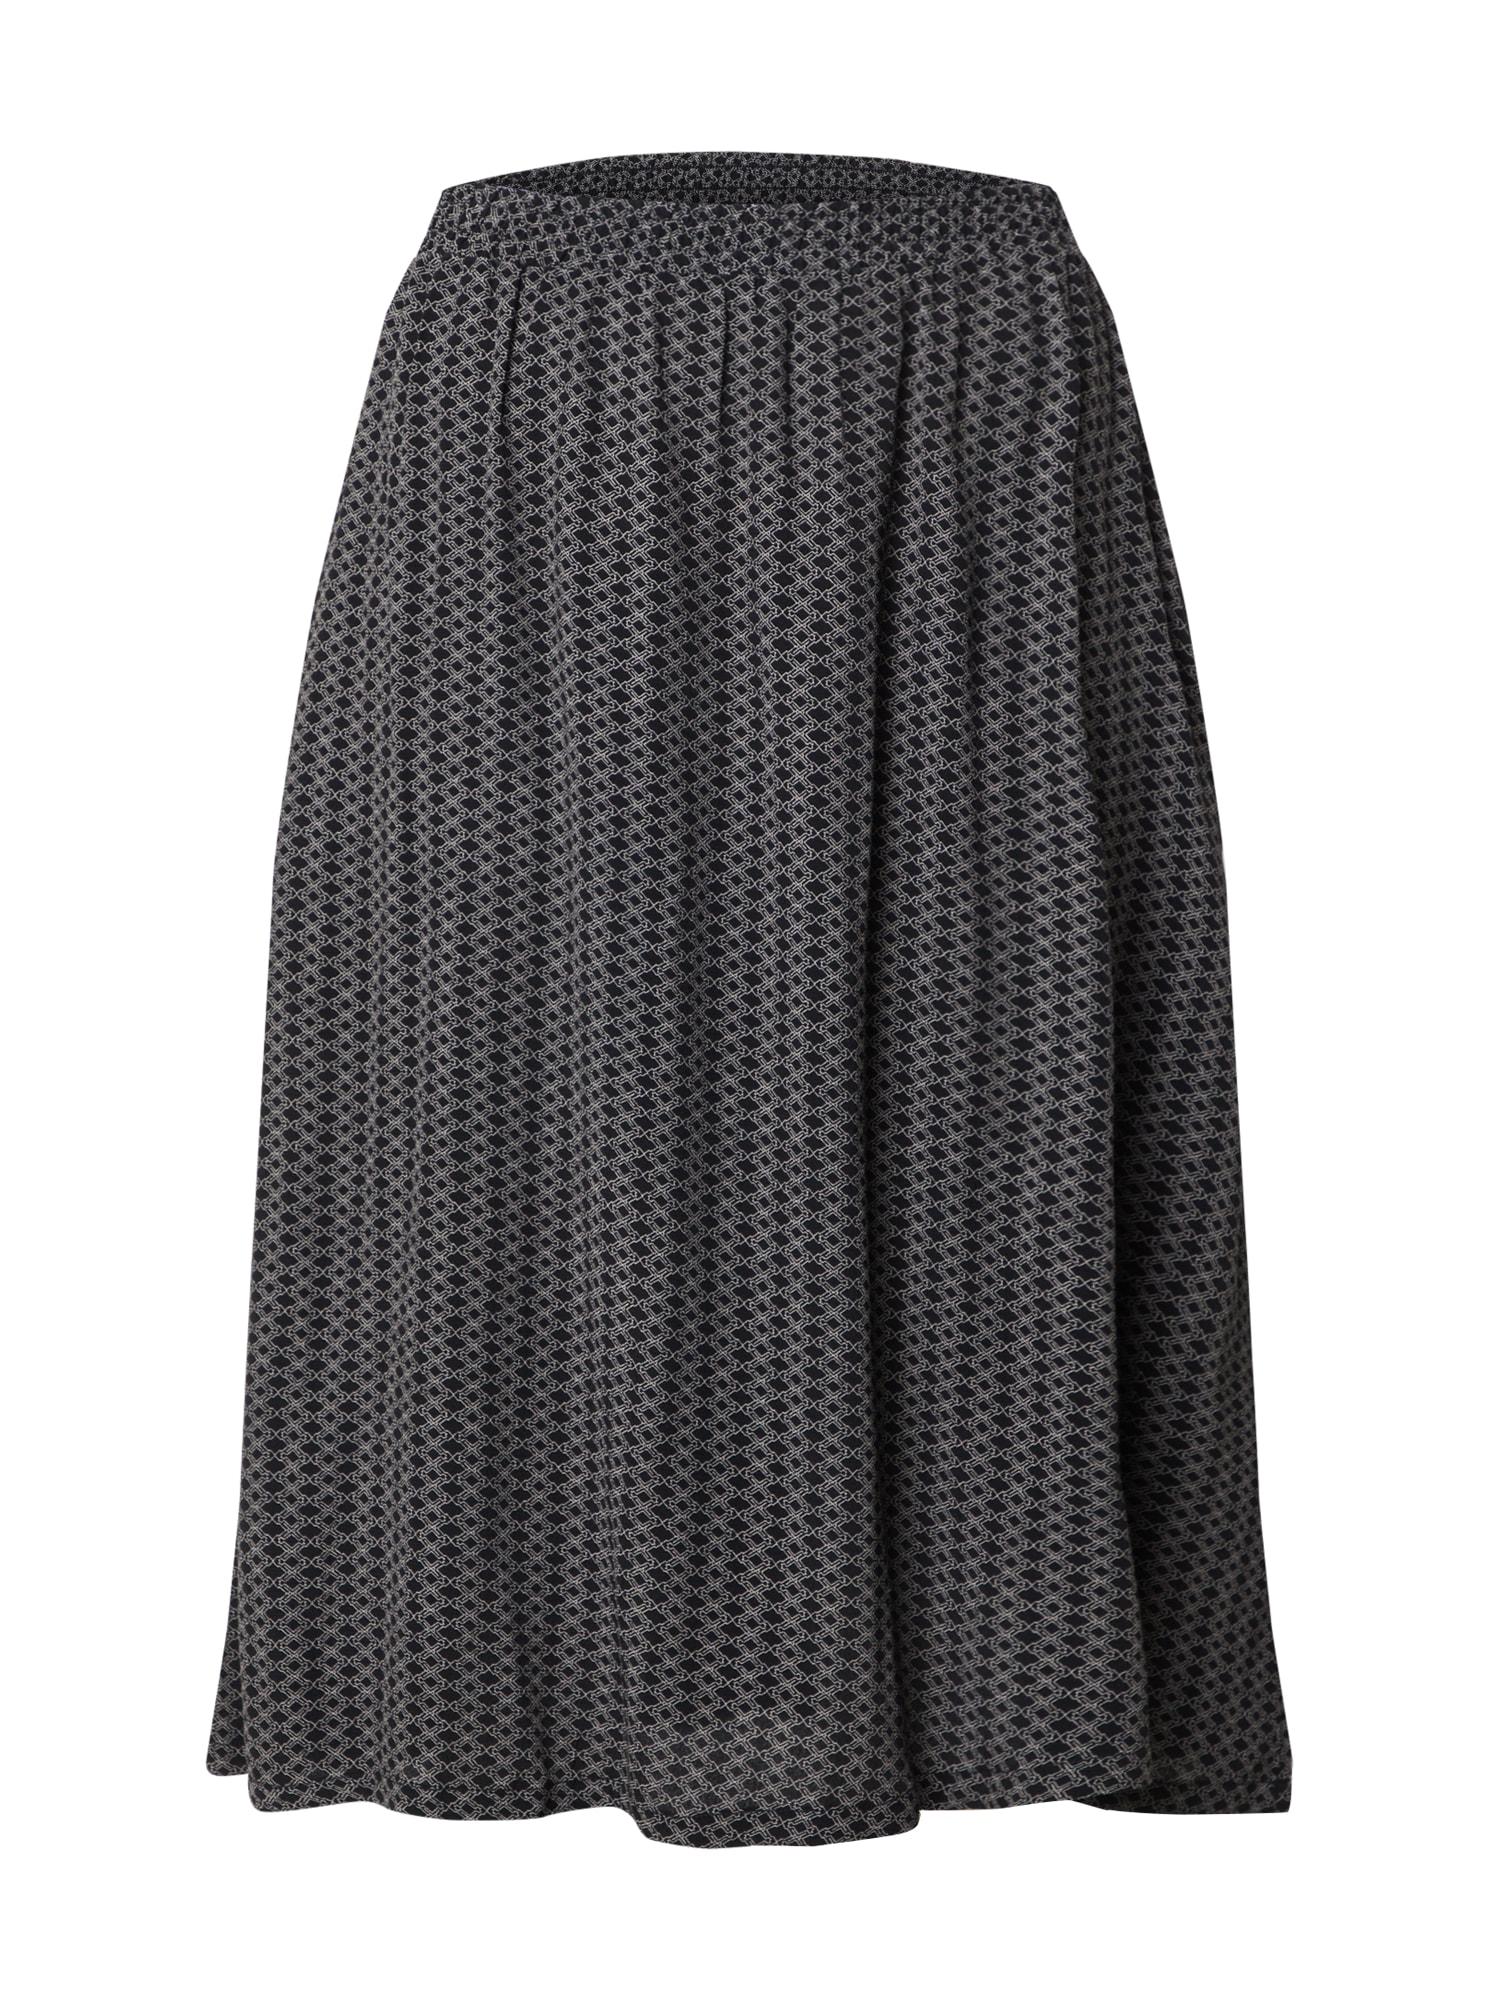 basic apparel Sijonas 'Elly' juoda